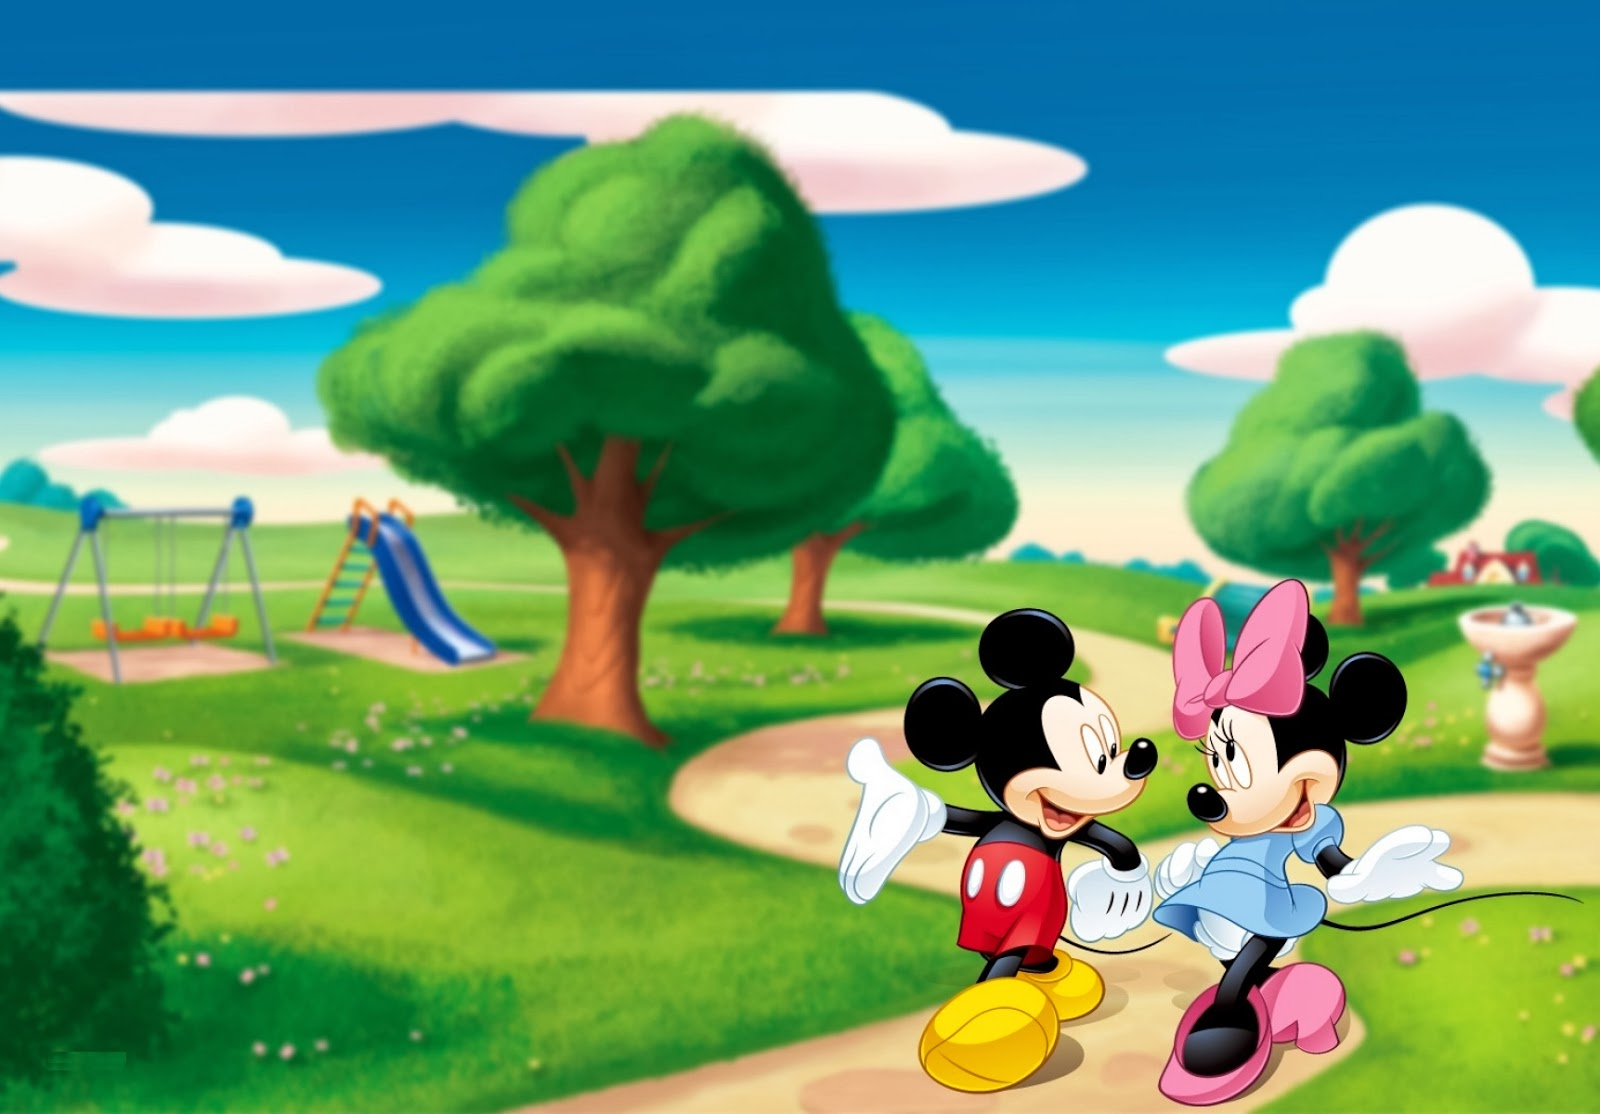 Hot Girl Wallpaper  Beautiful Disney Cartoon Minnie Mouse & Mickey